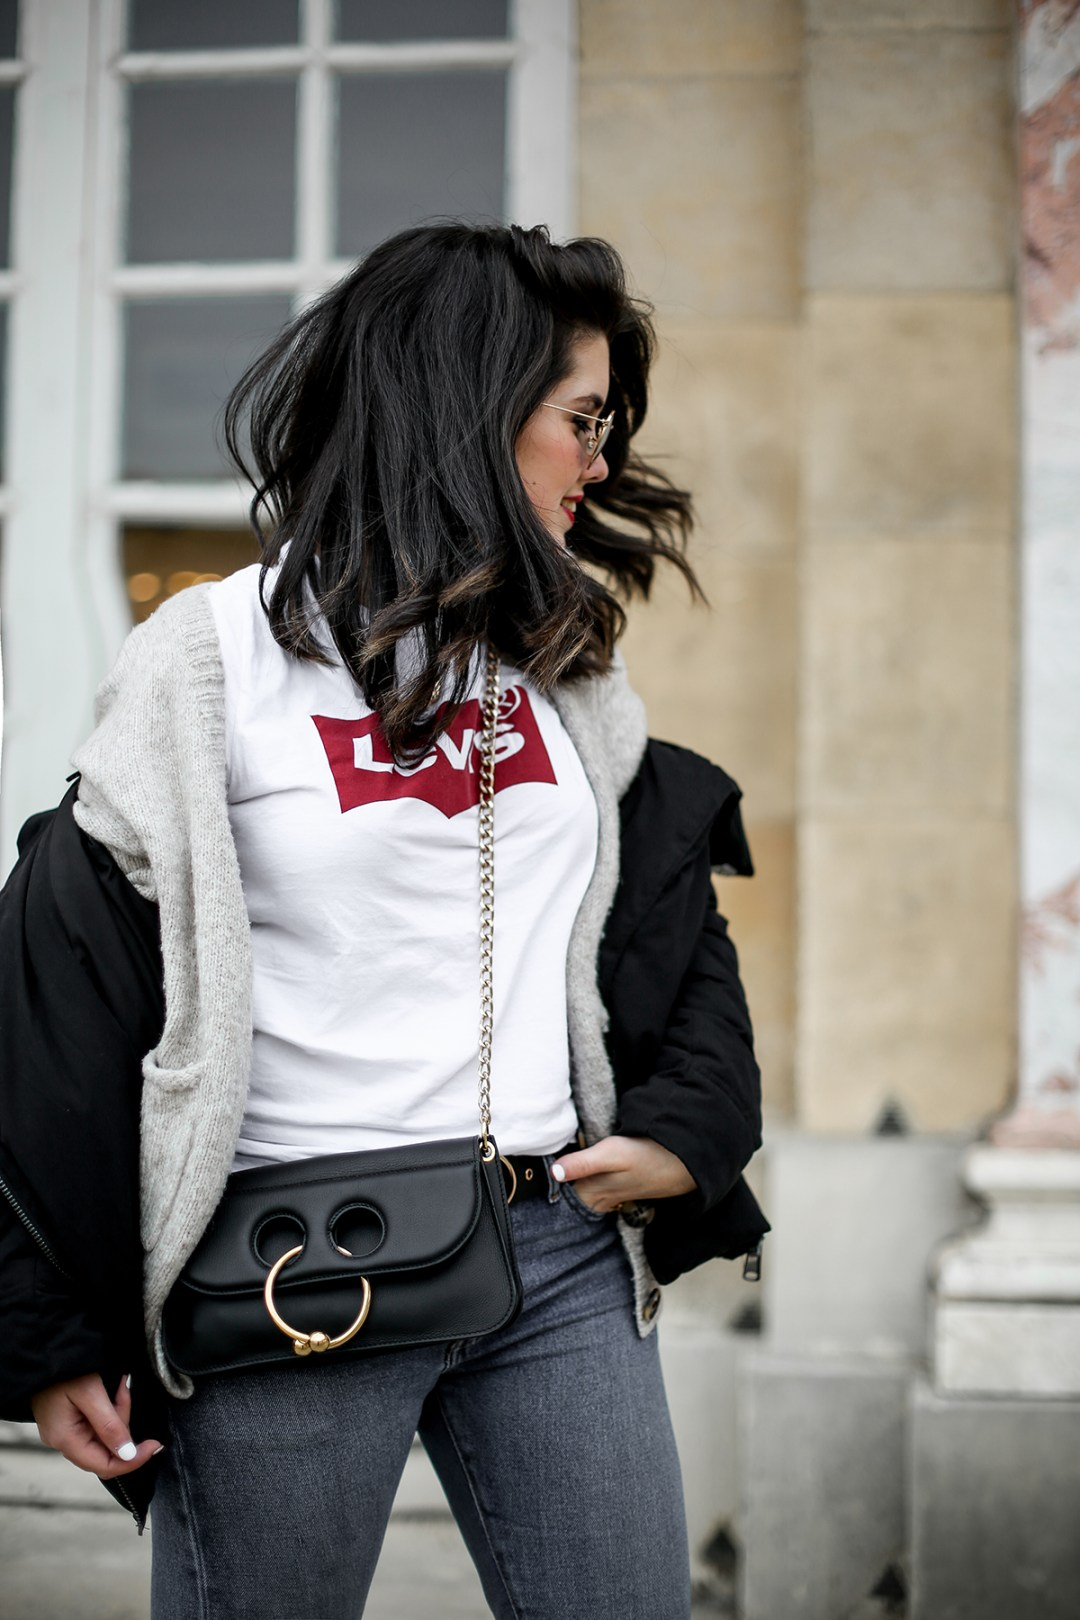 puffer-coat-levis-shirt-basic-505c-jeans-jw-anderson-pierce-bag-how-to-wear4